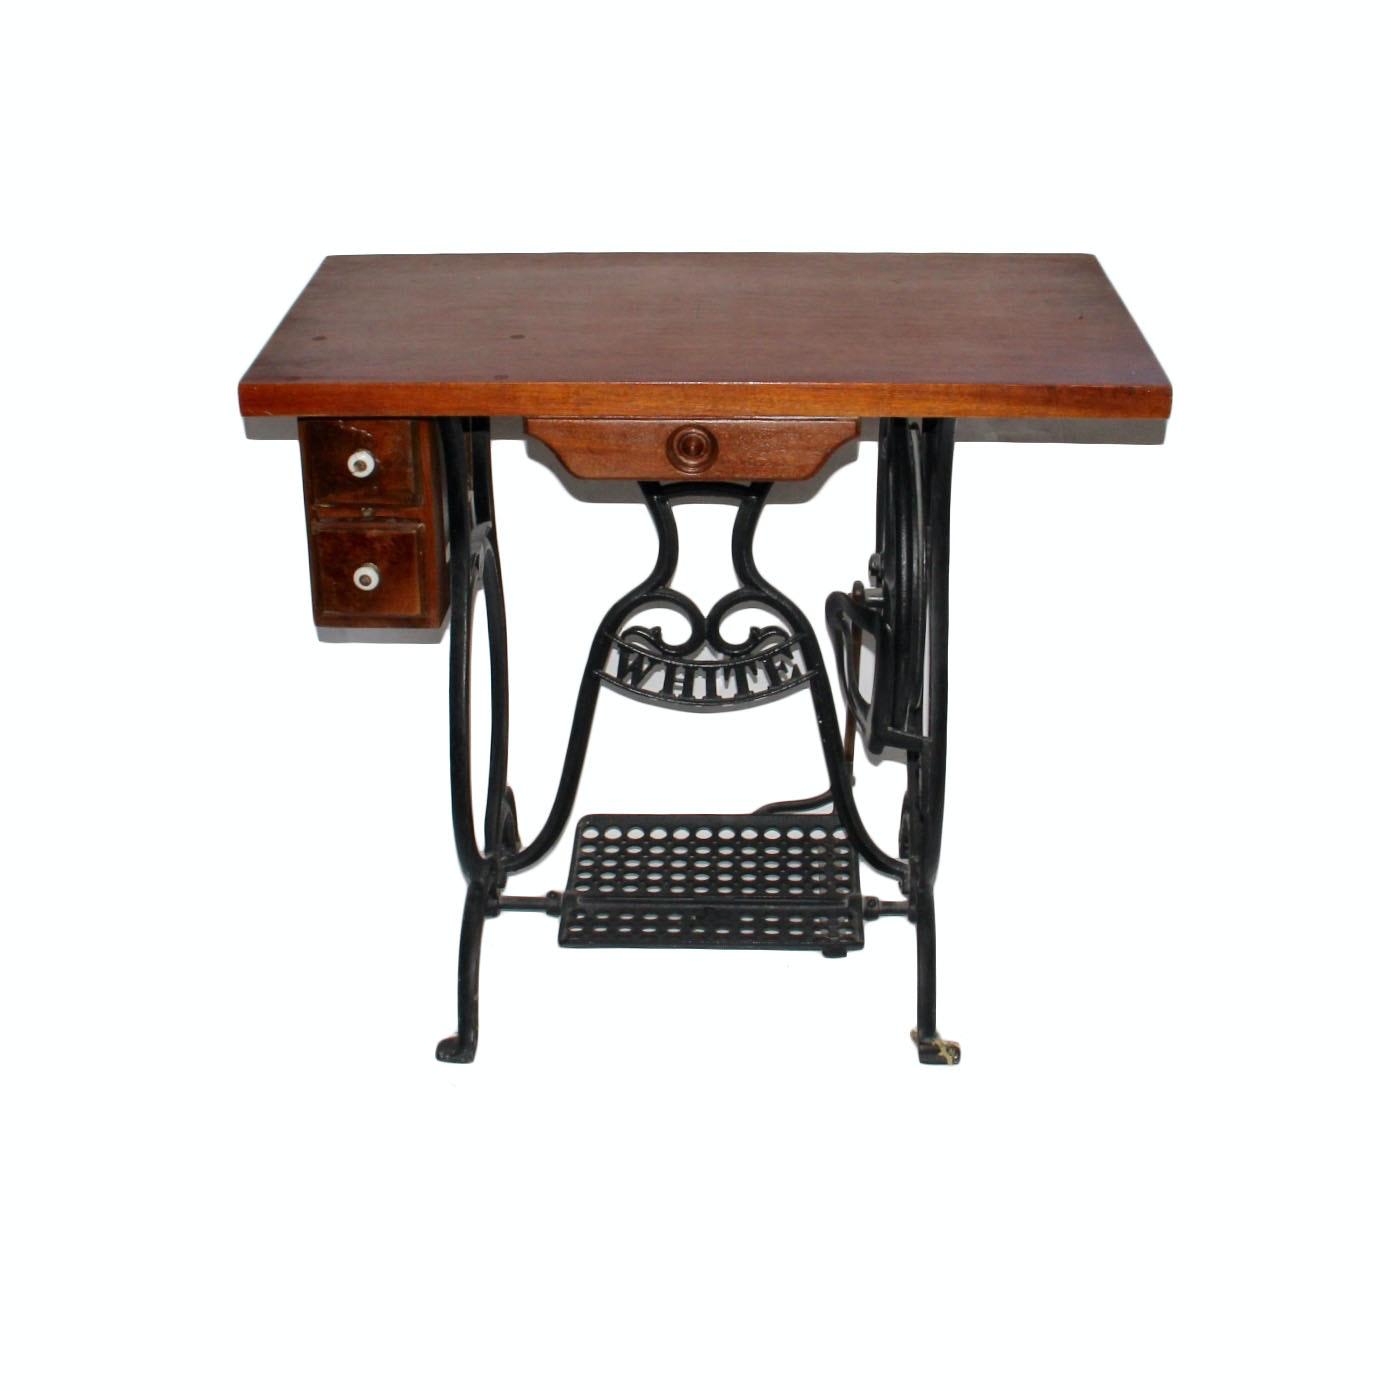 Singer Repurposed Sewing Table